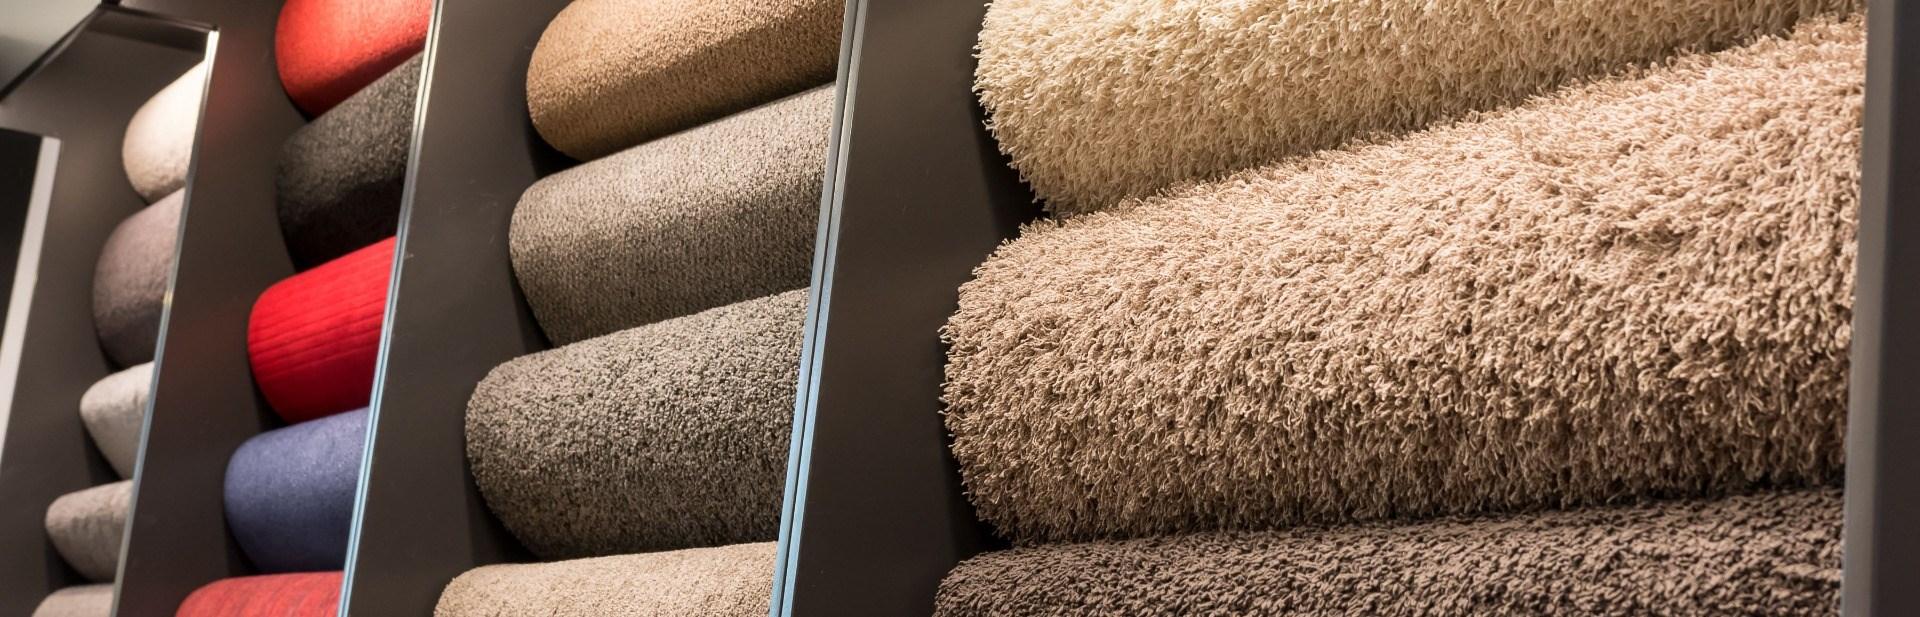 carpet and flooring. carpet and flooring o